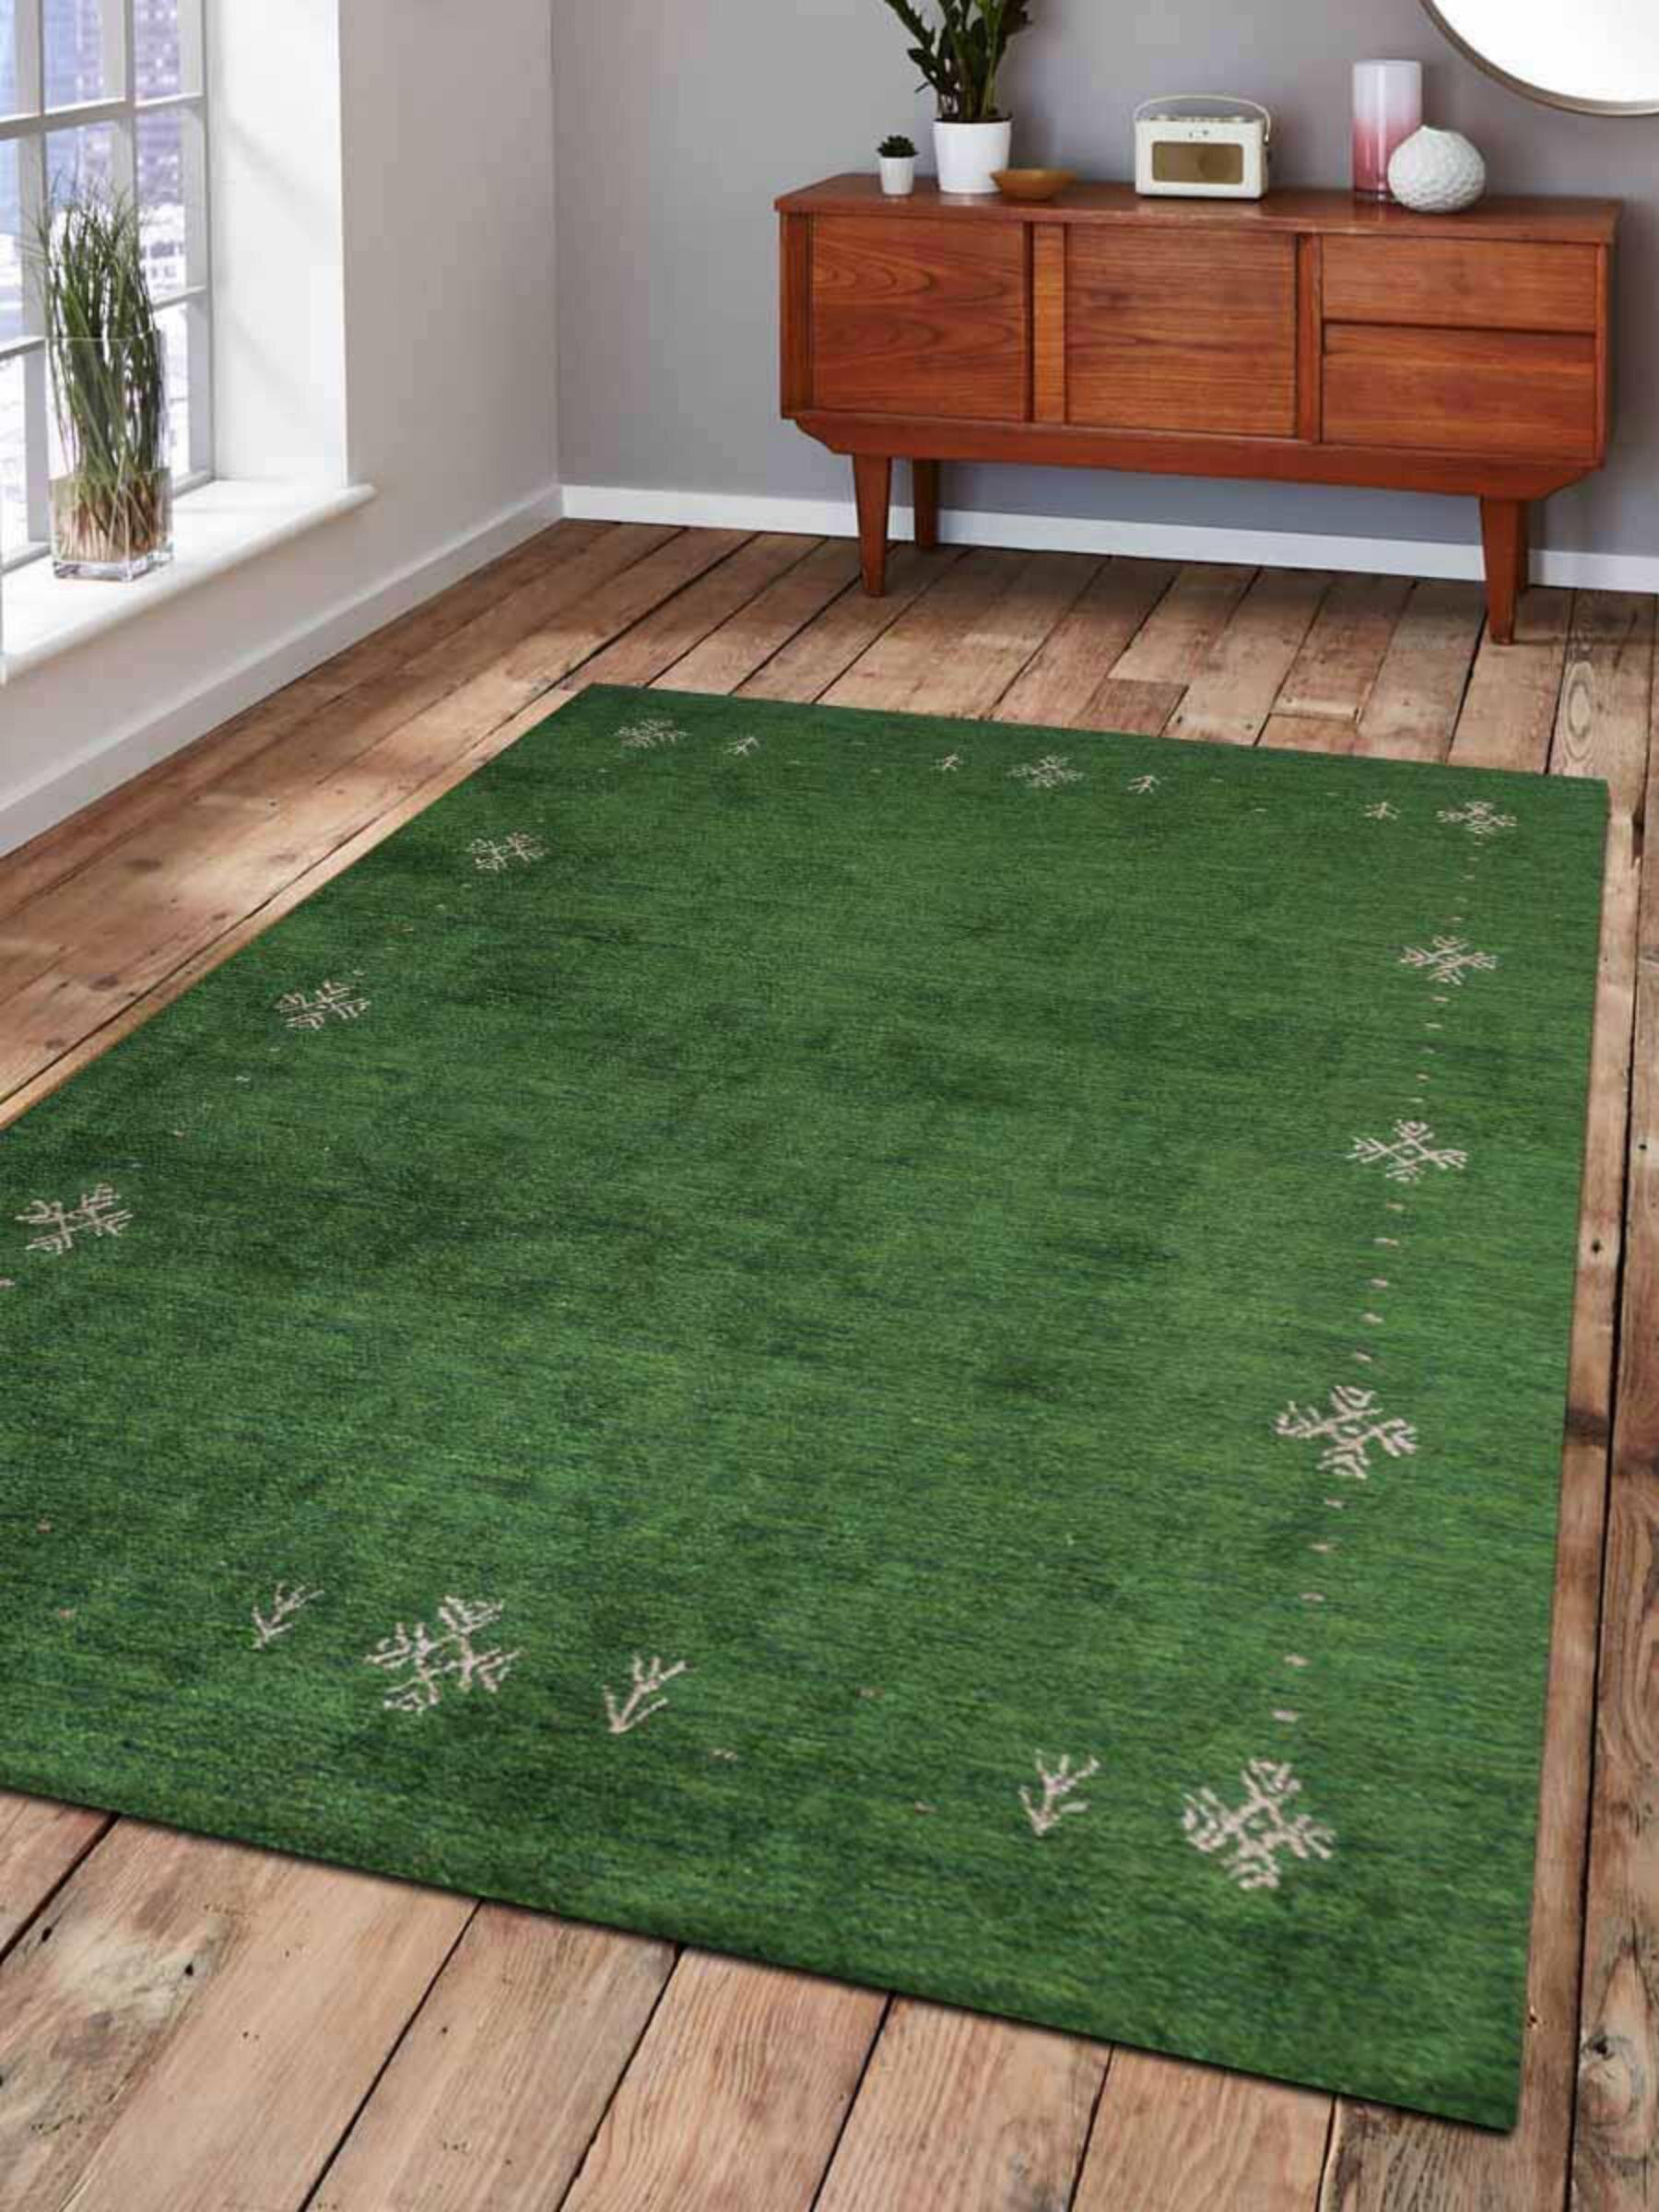 Green Silk Area Rugs You Ll Love In 2021 Wayfair